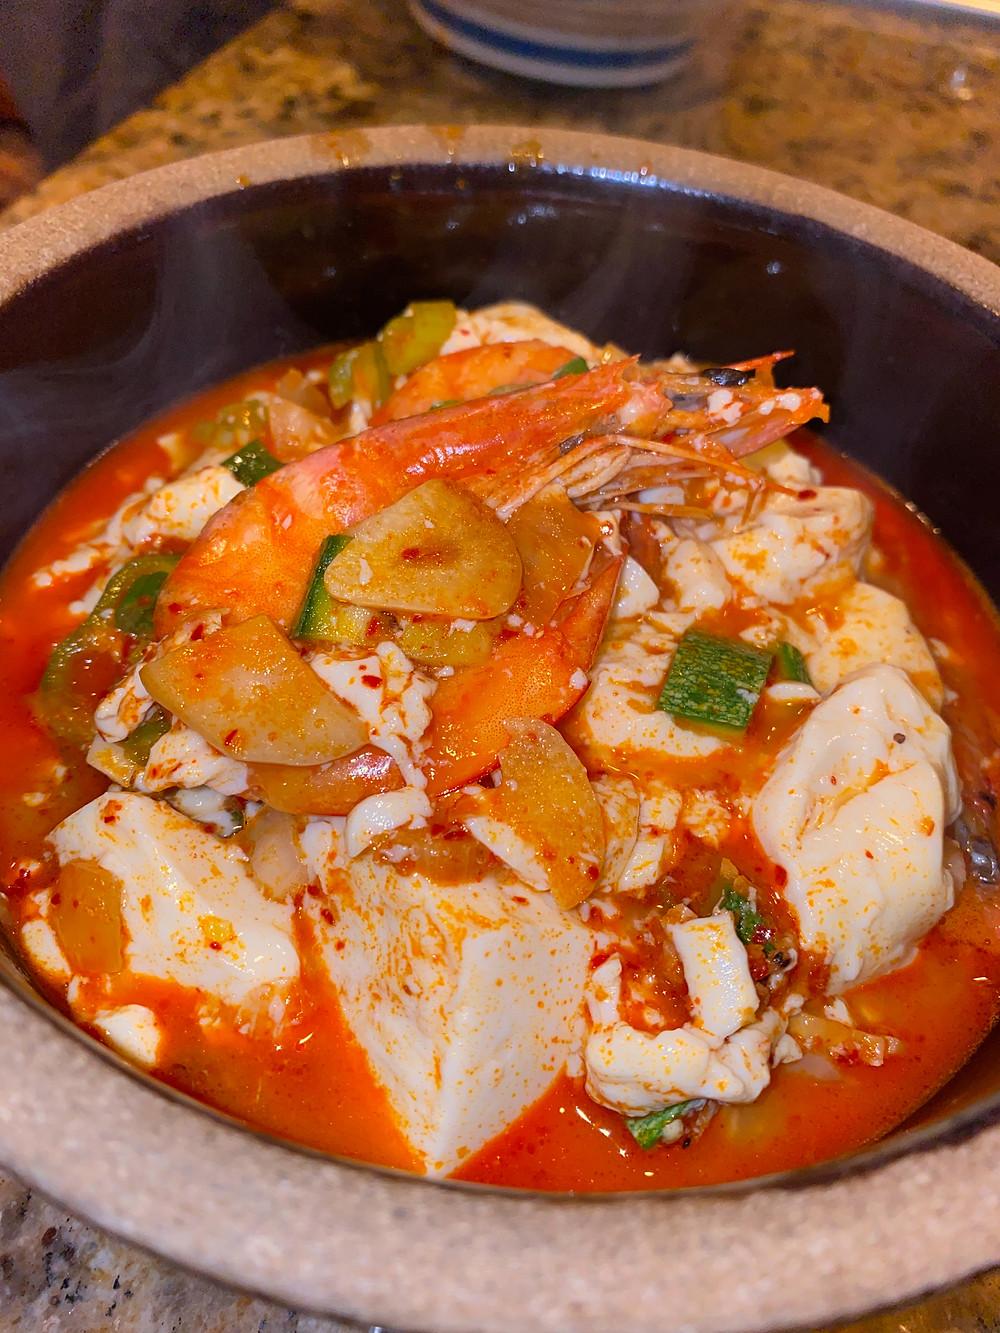 Spicy Korean Soft Tofu Stew with Shrimp